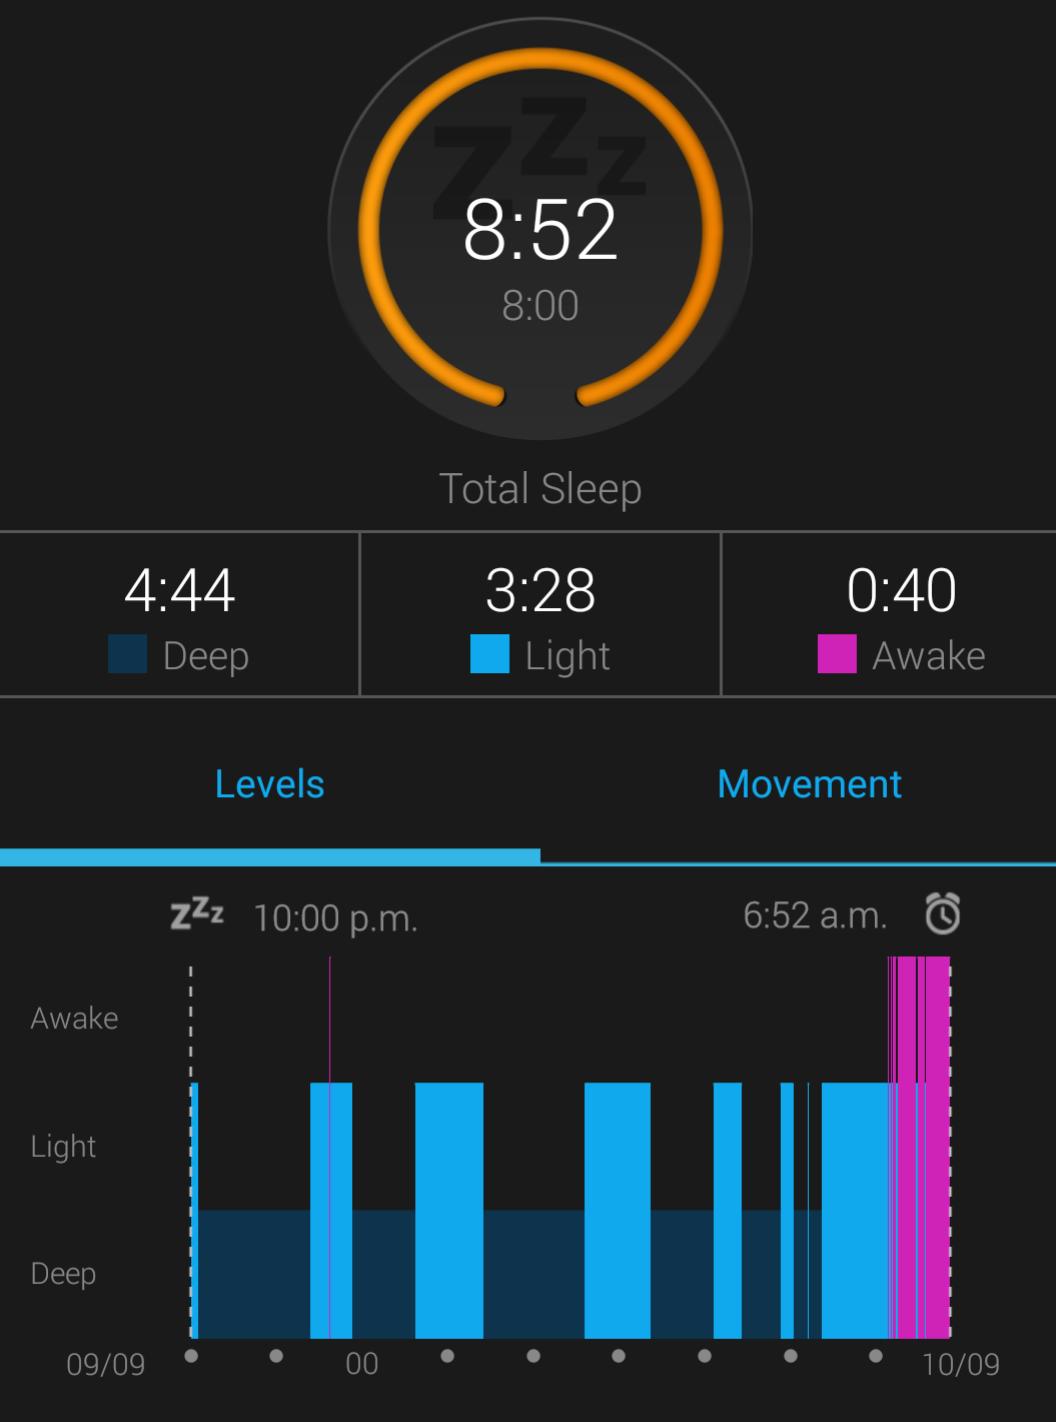 How to sleep more